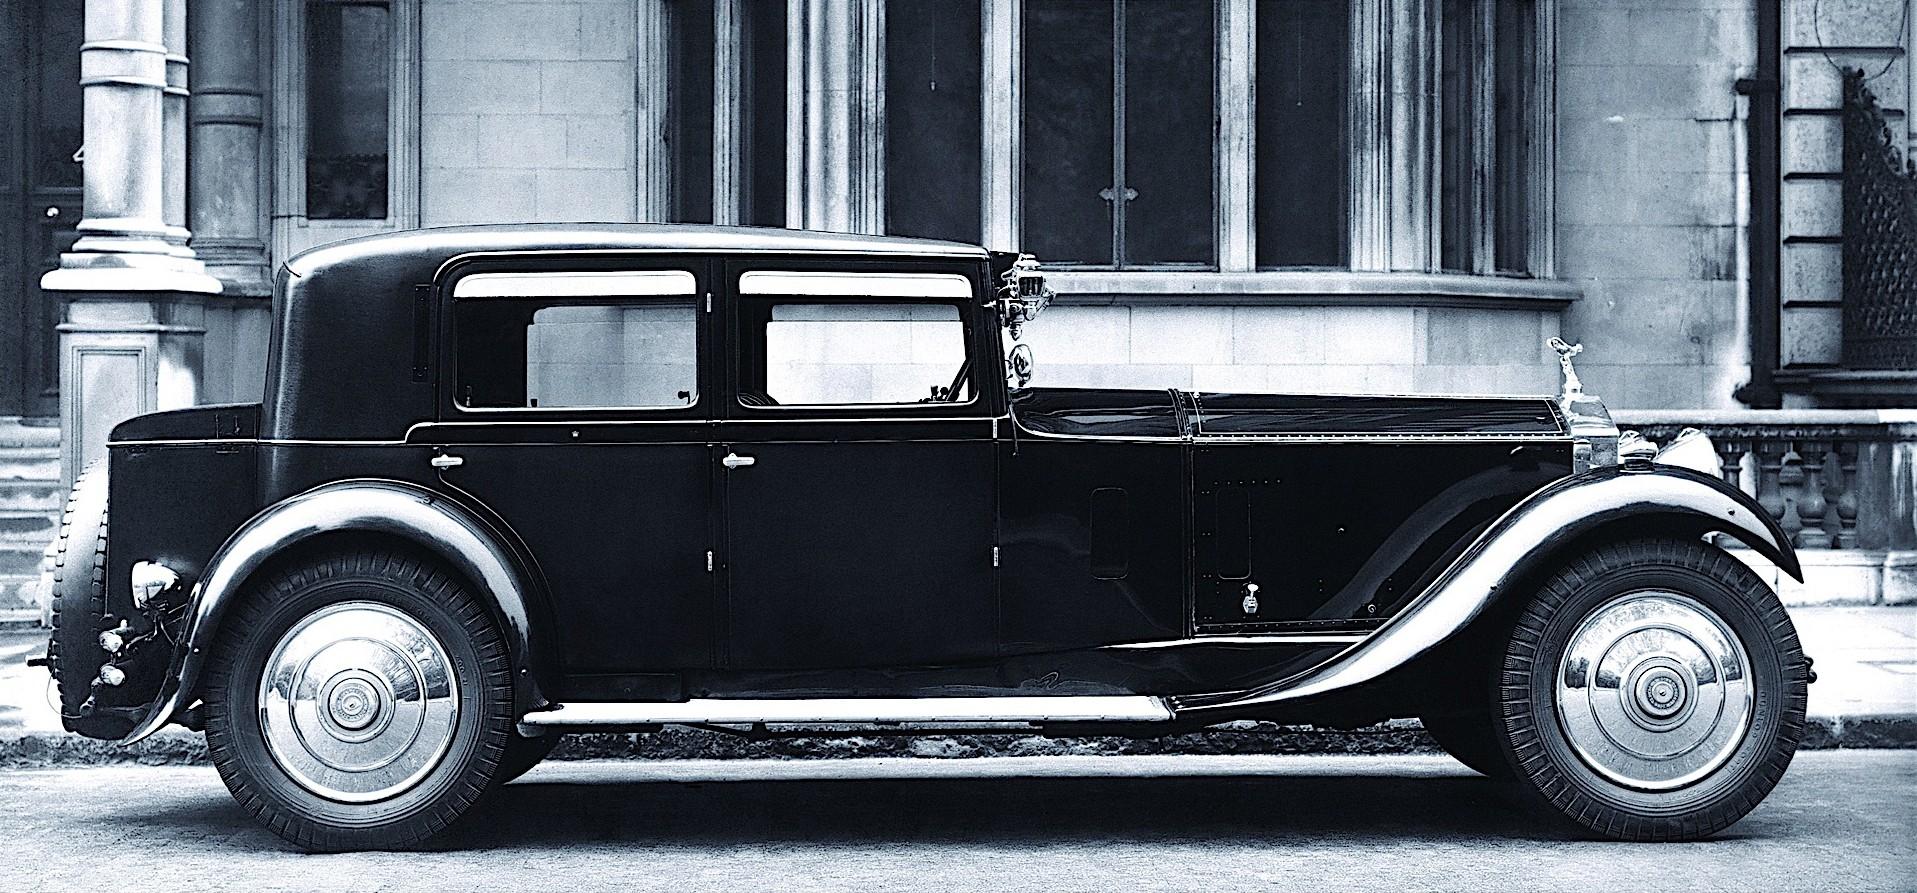 the astonishing history of the rolls-royce phantom - autoevolution